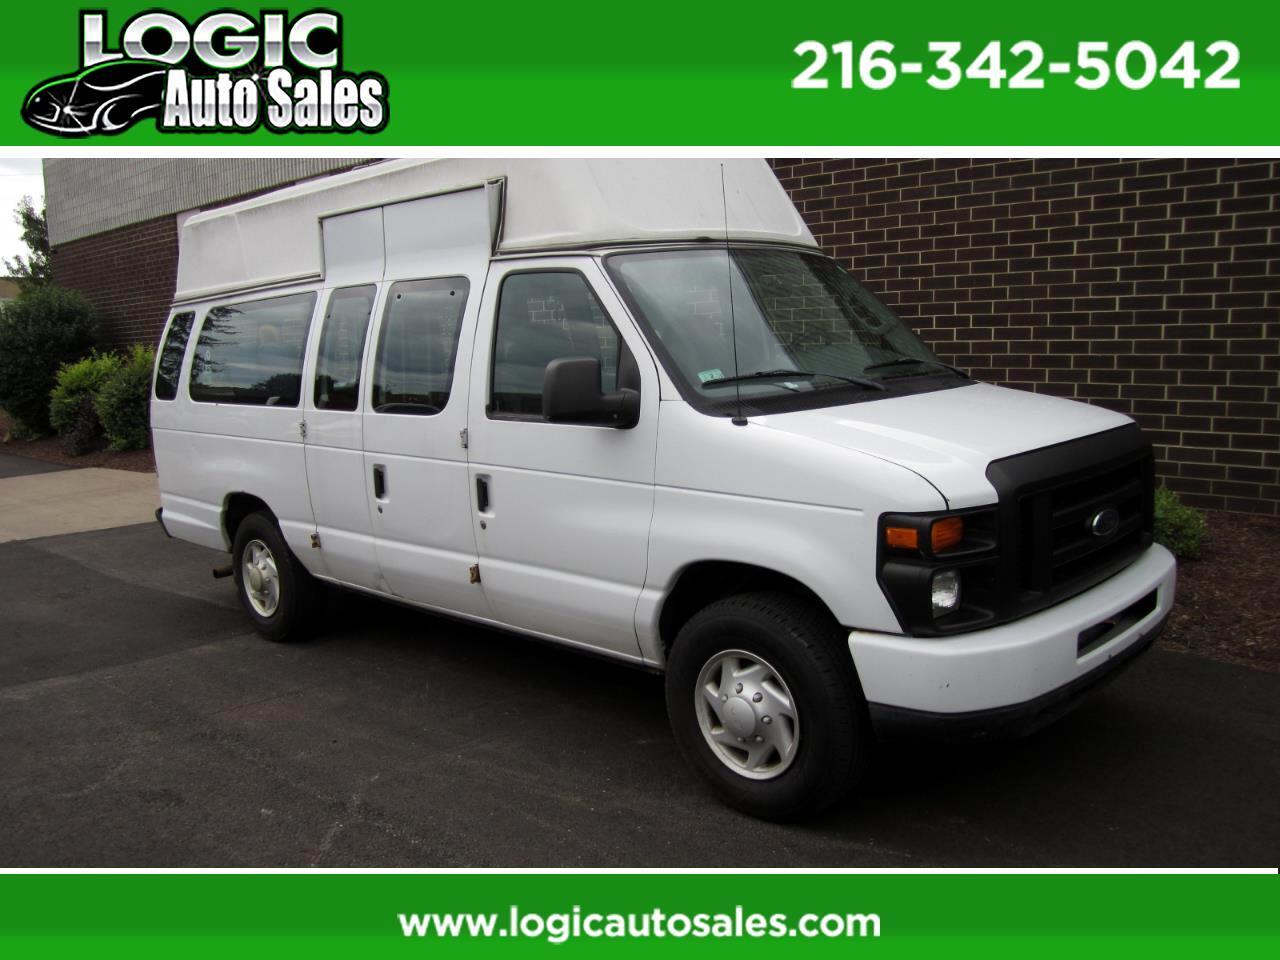 2008 Ford Econoline Cargo Van E-250 Ext Commercial